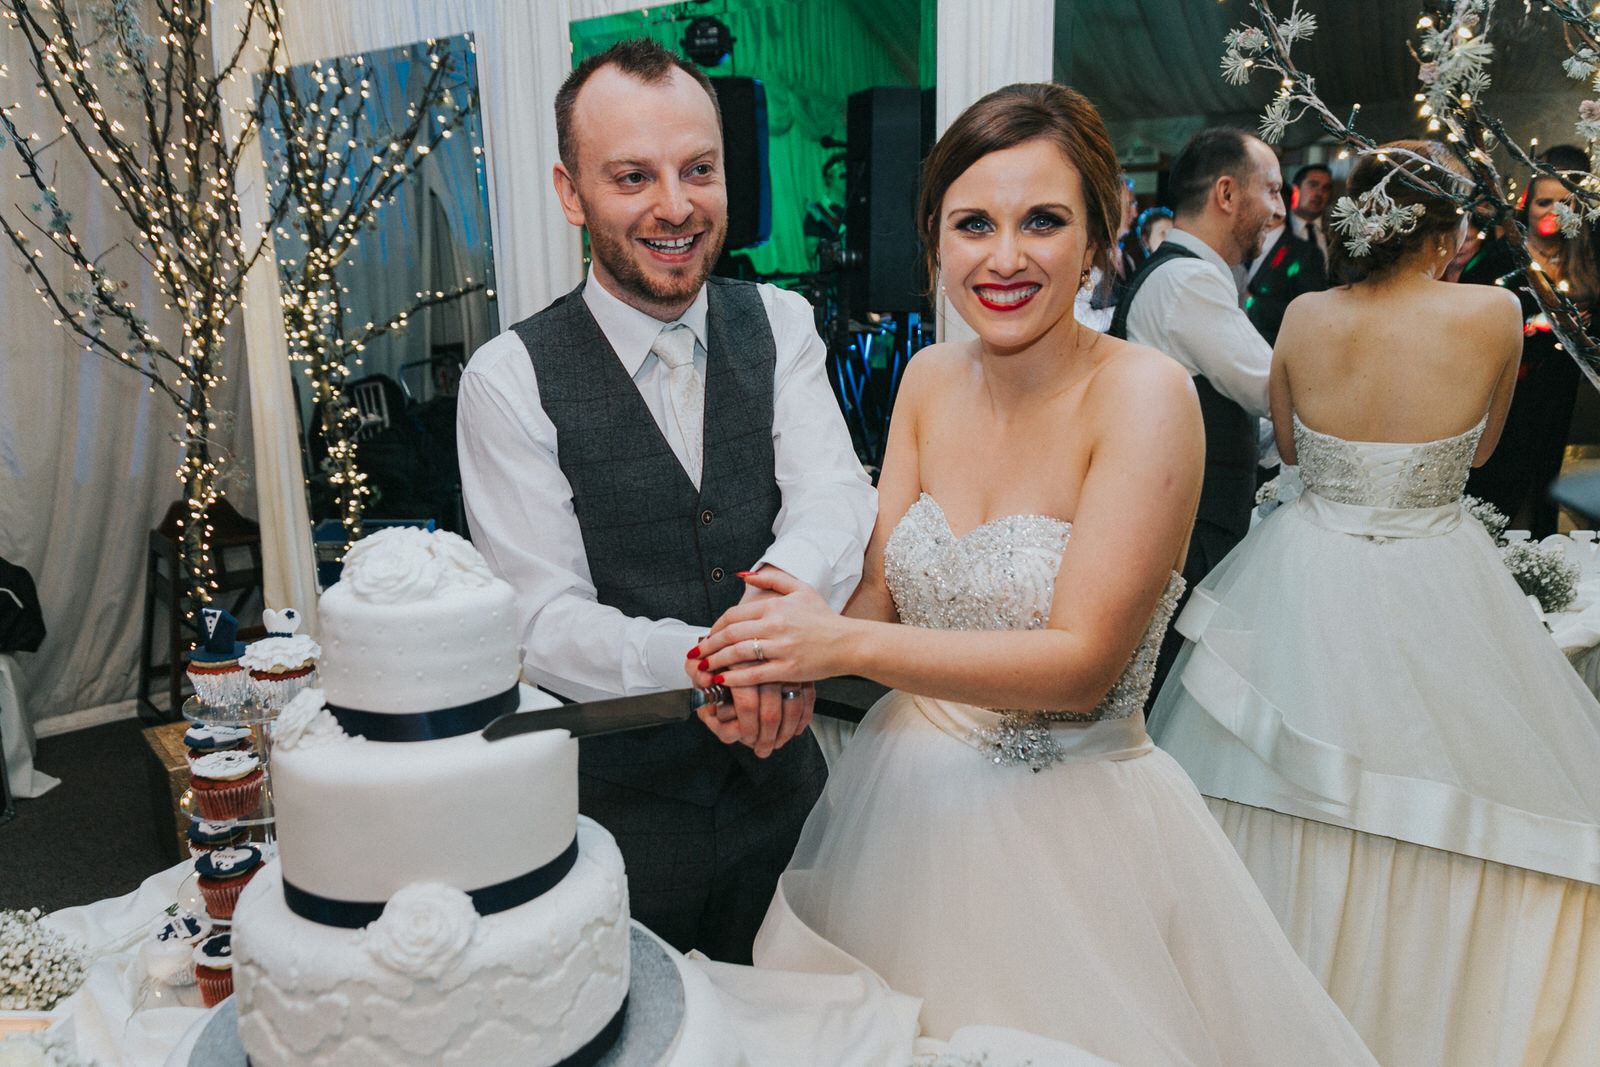 Clonabreany_wedding-photographer_roger_kenny_ireland_119.jpg